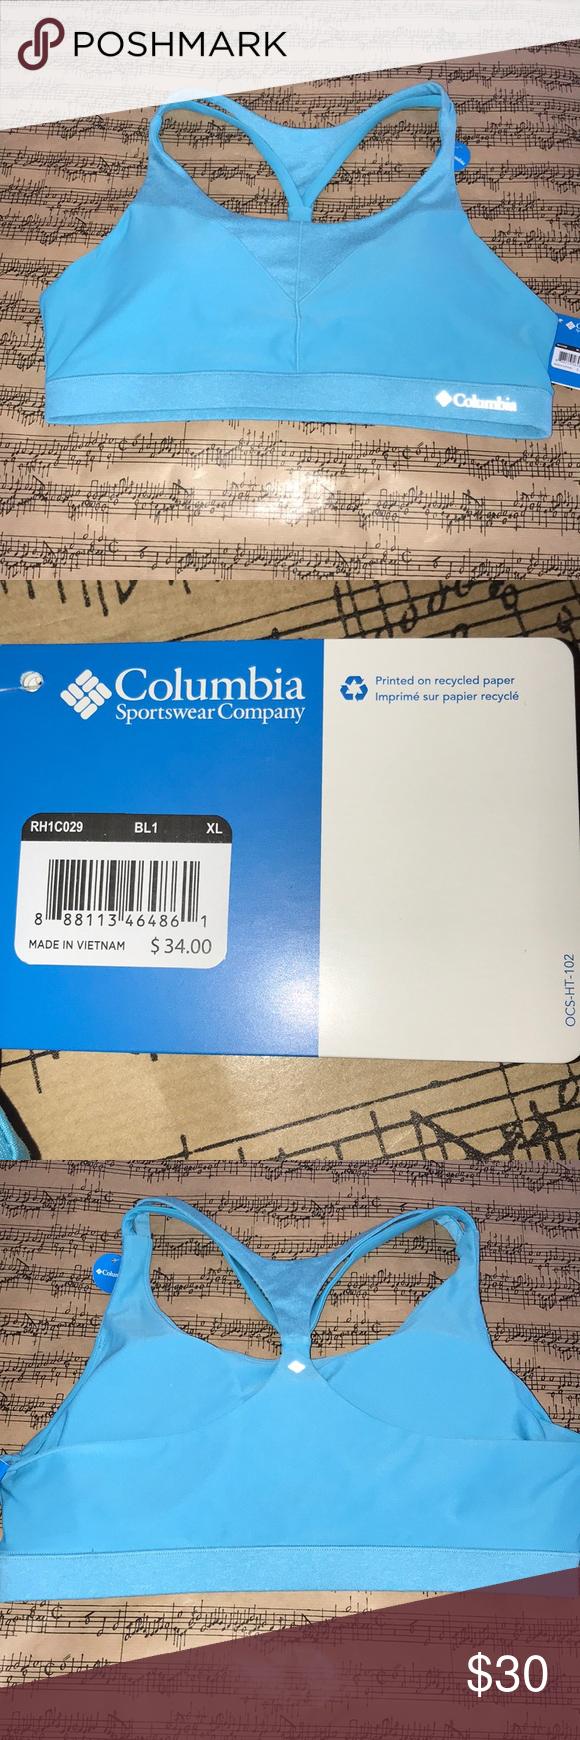 59532b3b3cce9 Columbia Sports bra size XL Columbia sports bra new with tags size XL high  support Columbia Intimates   Sleepwear Bras